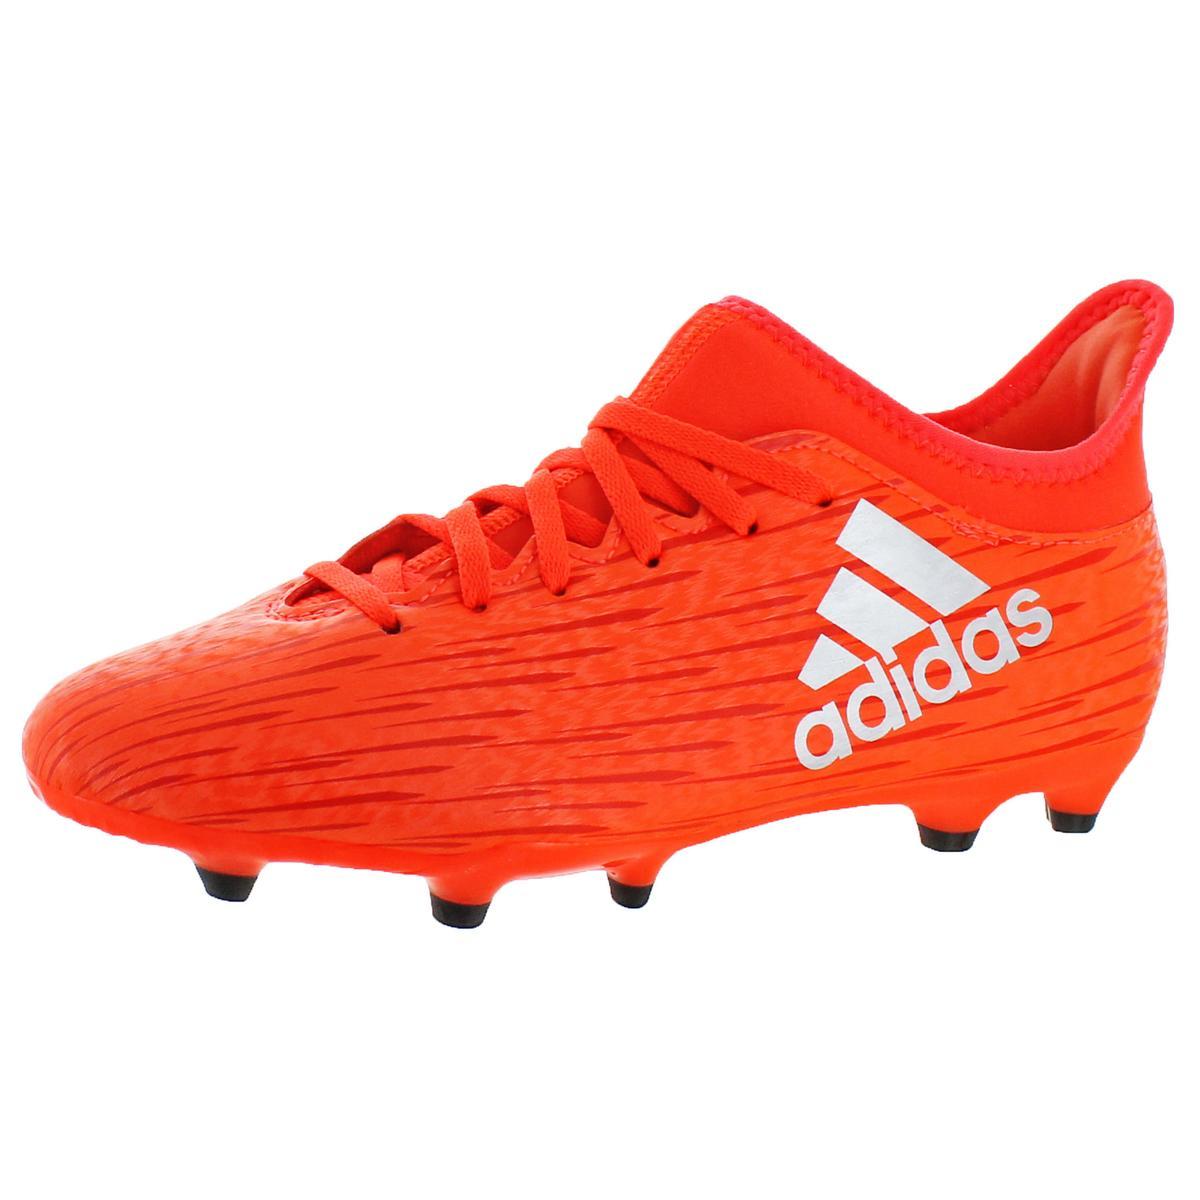 90e23d558d84 Adidas X 16.3 Firm Ground Boys Big Kid Athletic Cleats